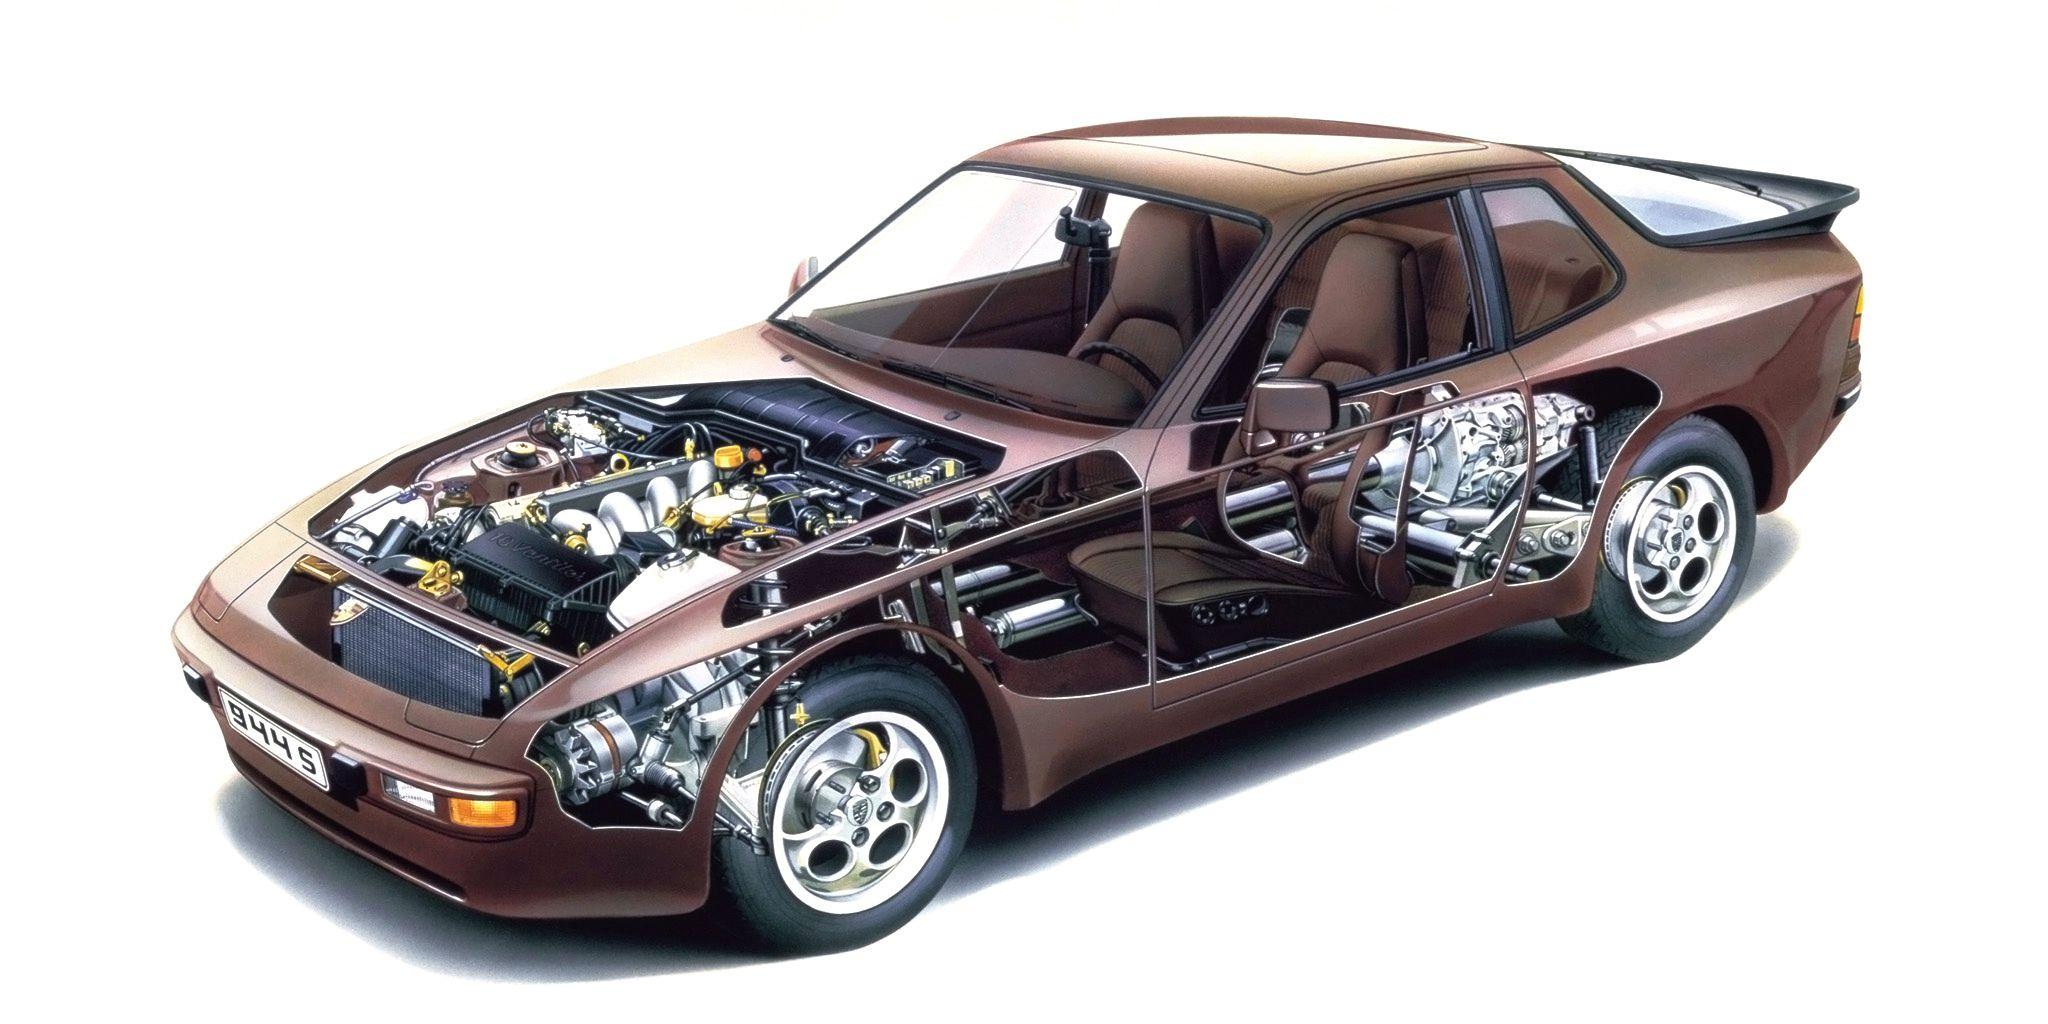 Scion Boxer Engine Diagram | Repair Manual on